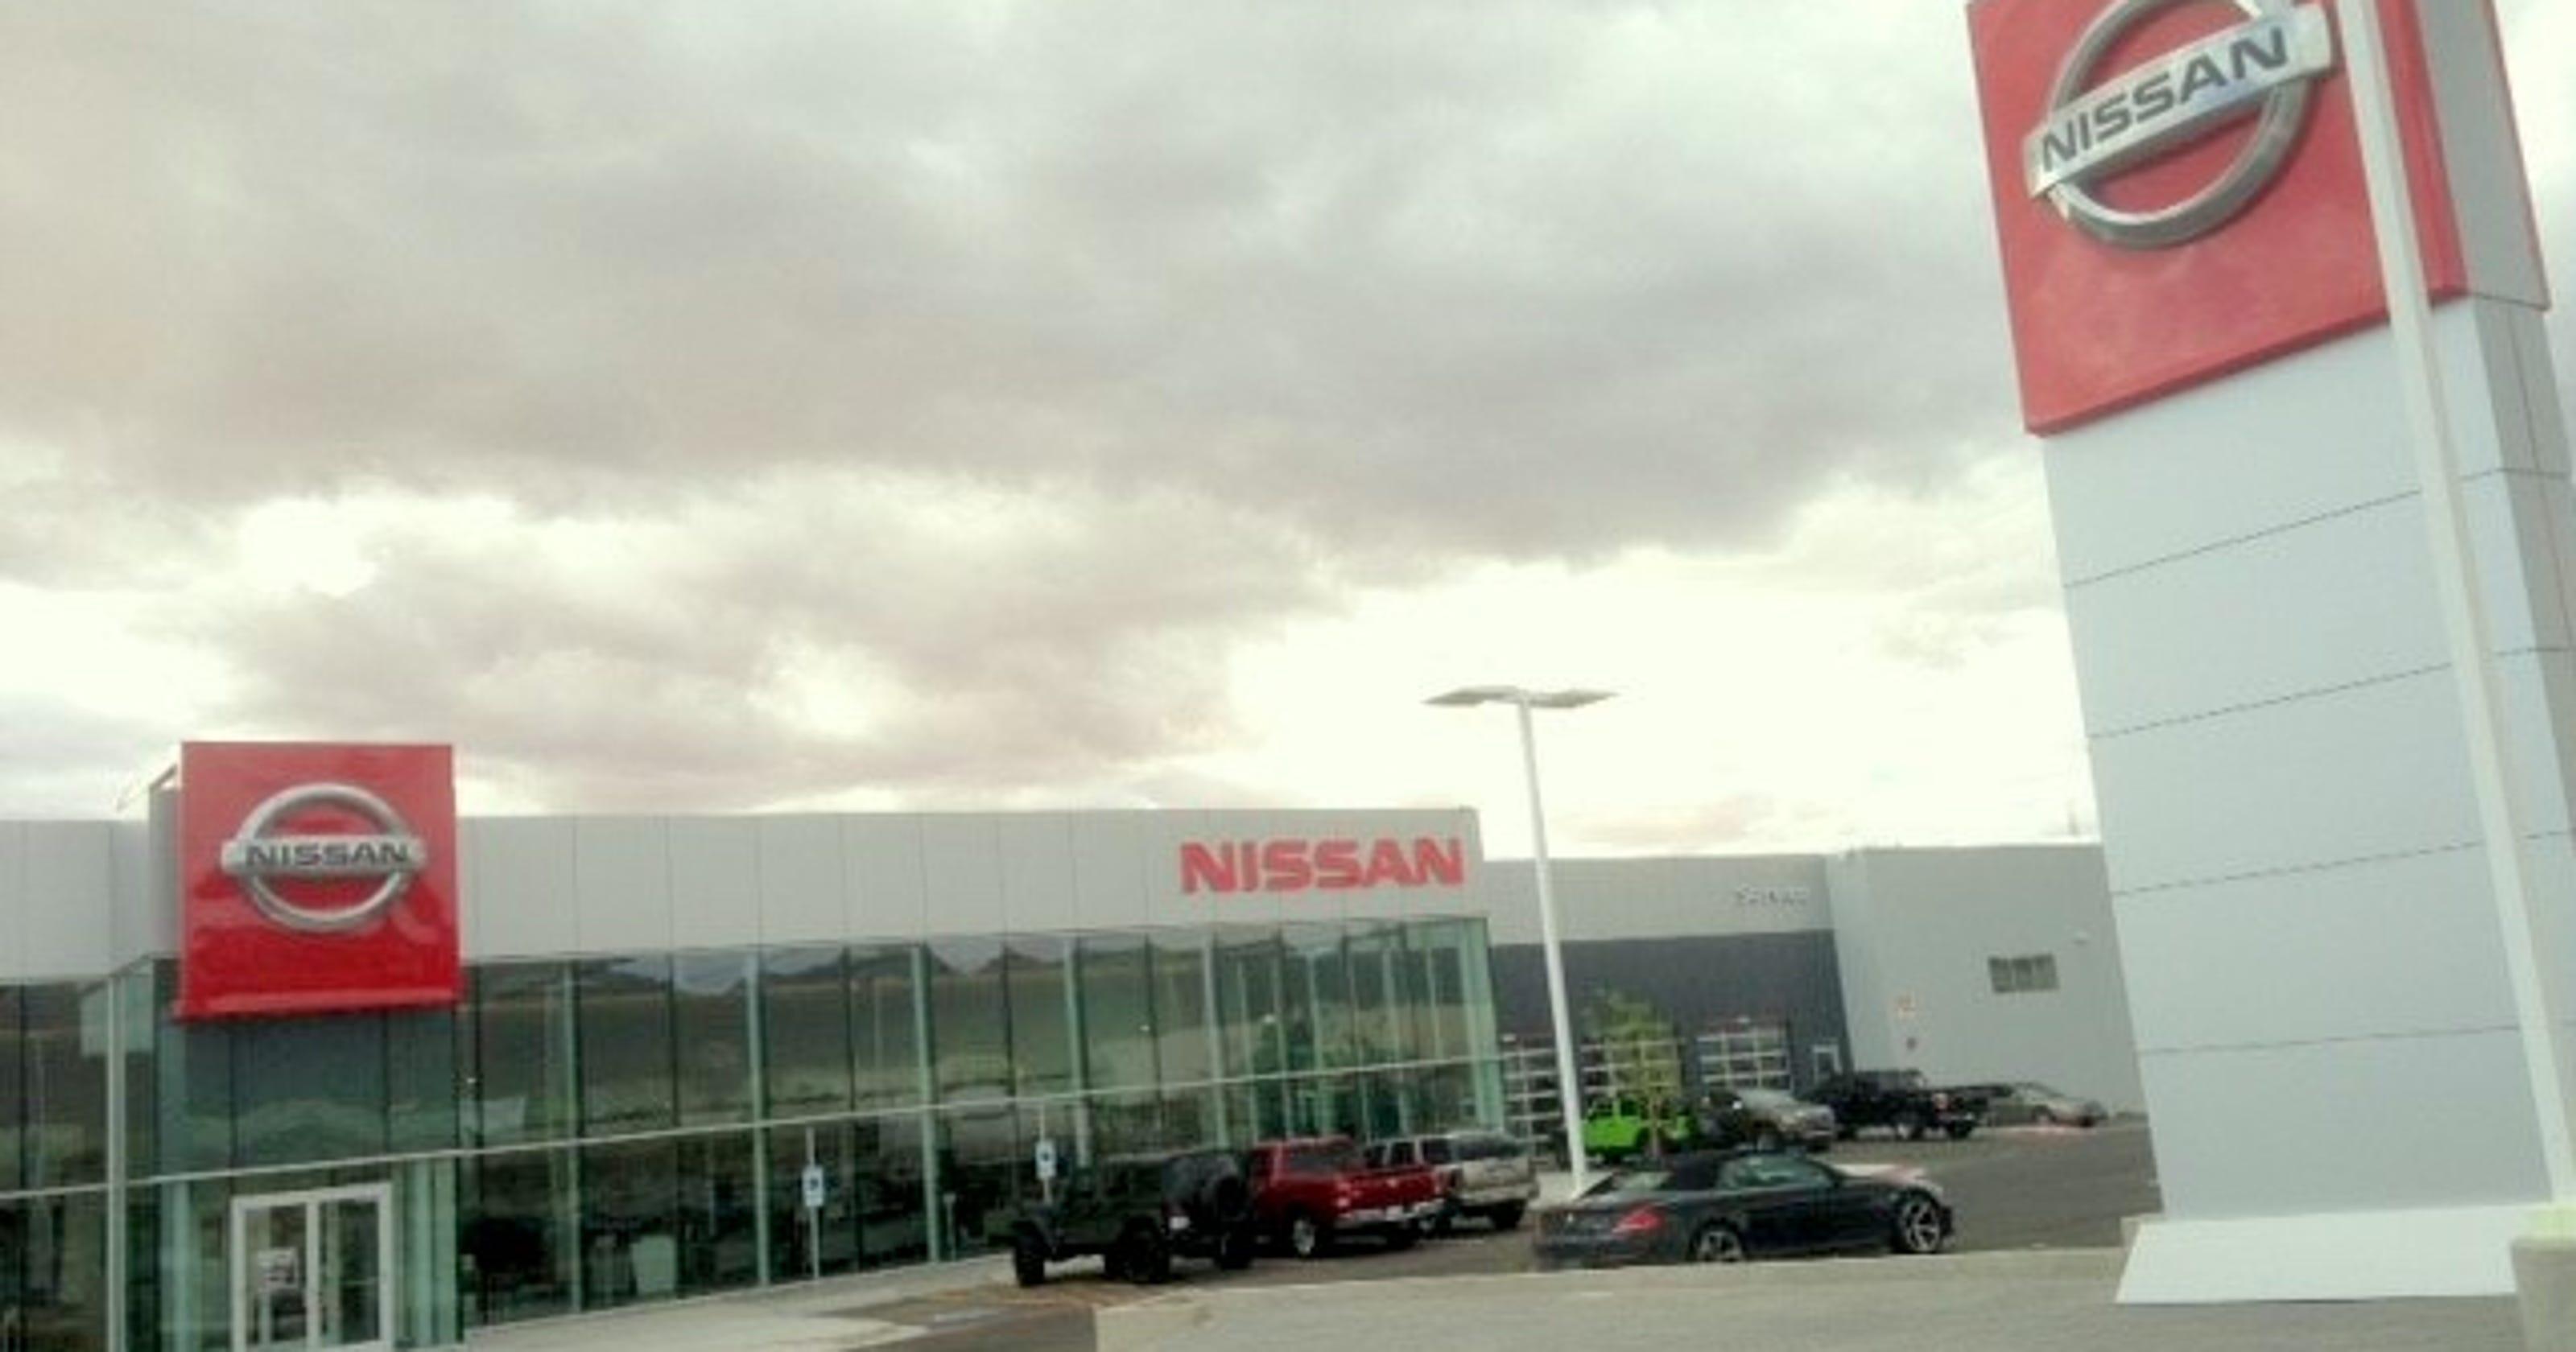 New El Paso Nissan Dealership Opens